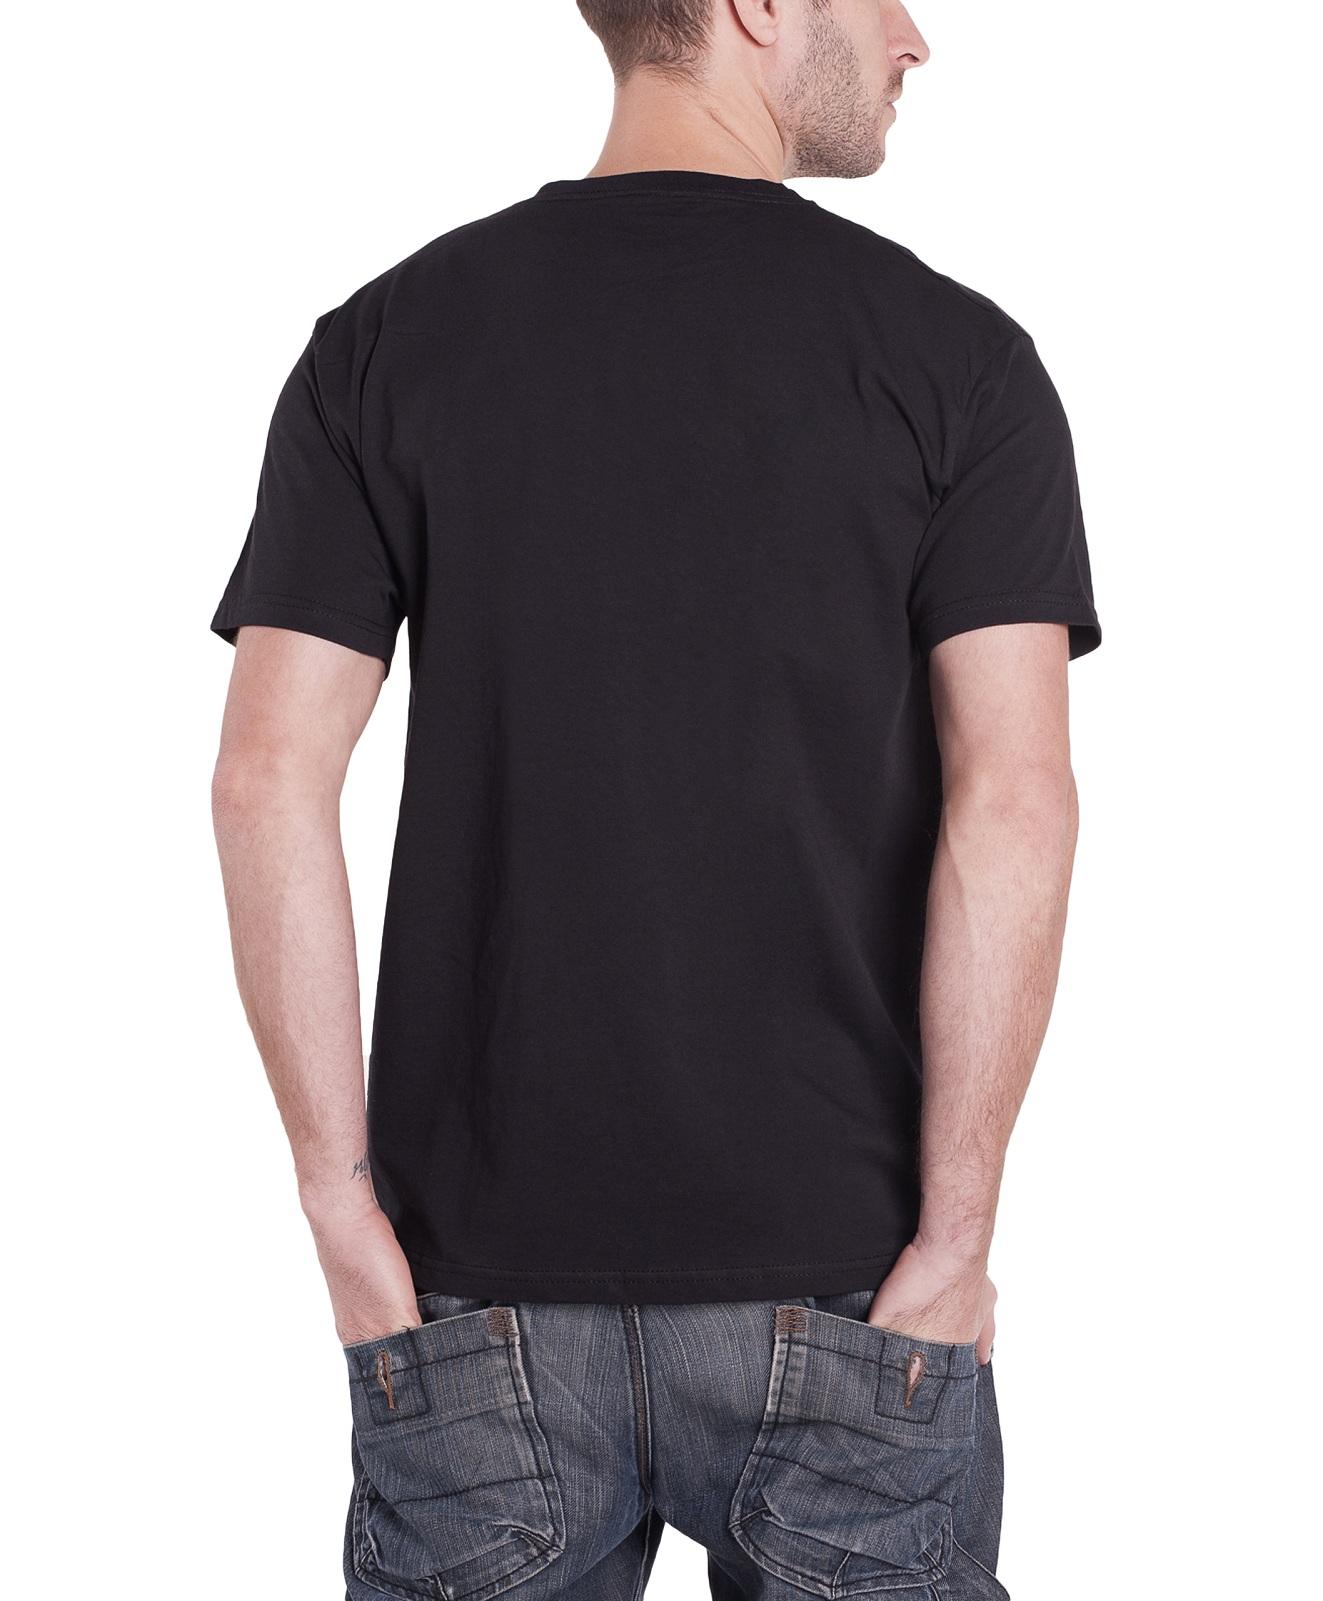 Motorhead-T-Shirt-Lemmy-RIP-England-warpig-clean-your-clock-official-new-mens Indexbild 53